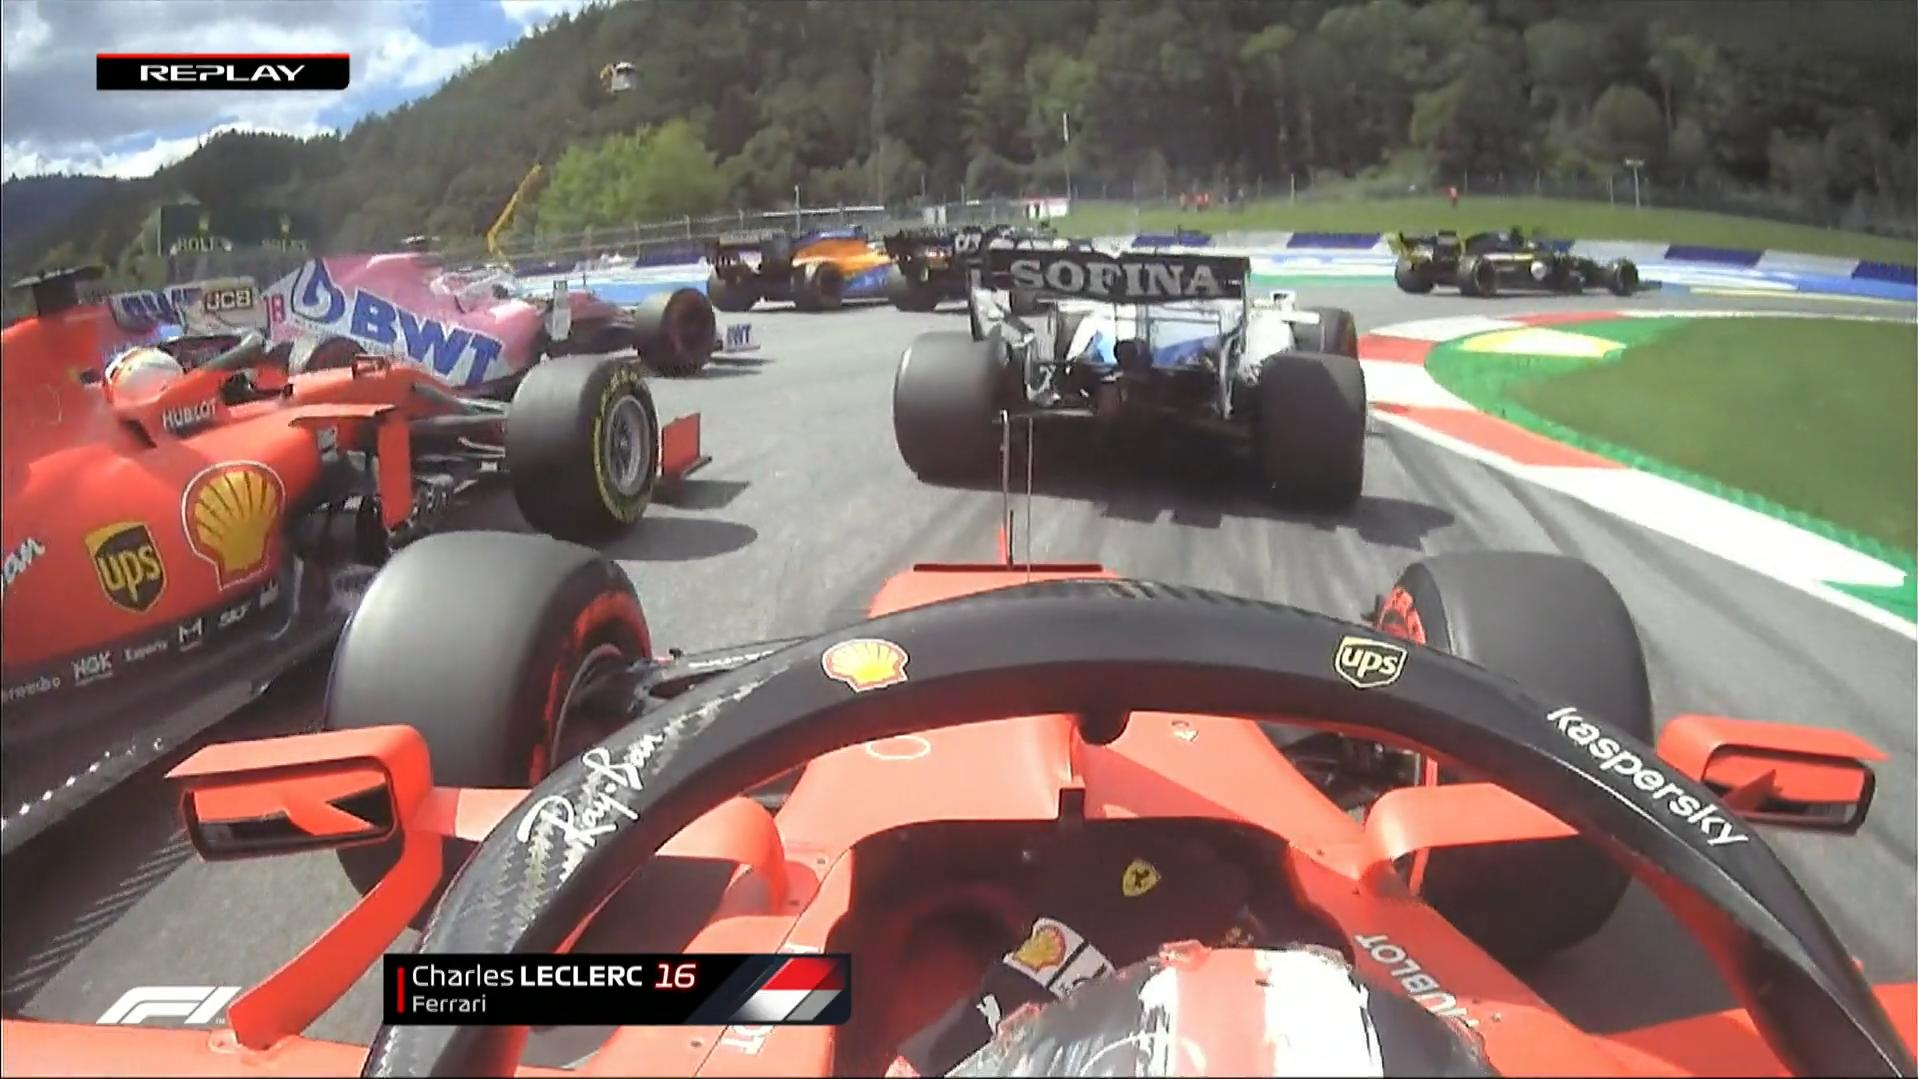 Formel 1 Ferrari Fiasko In Spielberg Charles Leclerc Schiesst Sebastian Vettel Ab